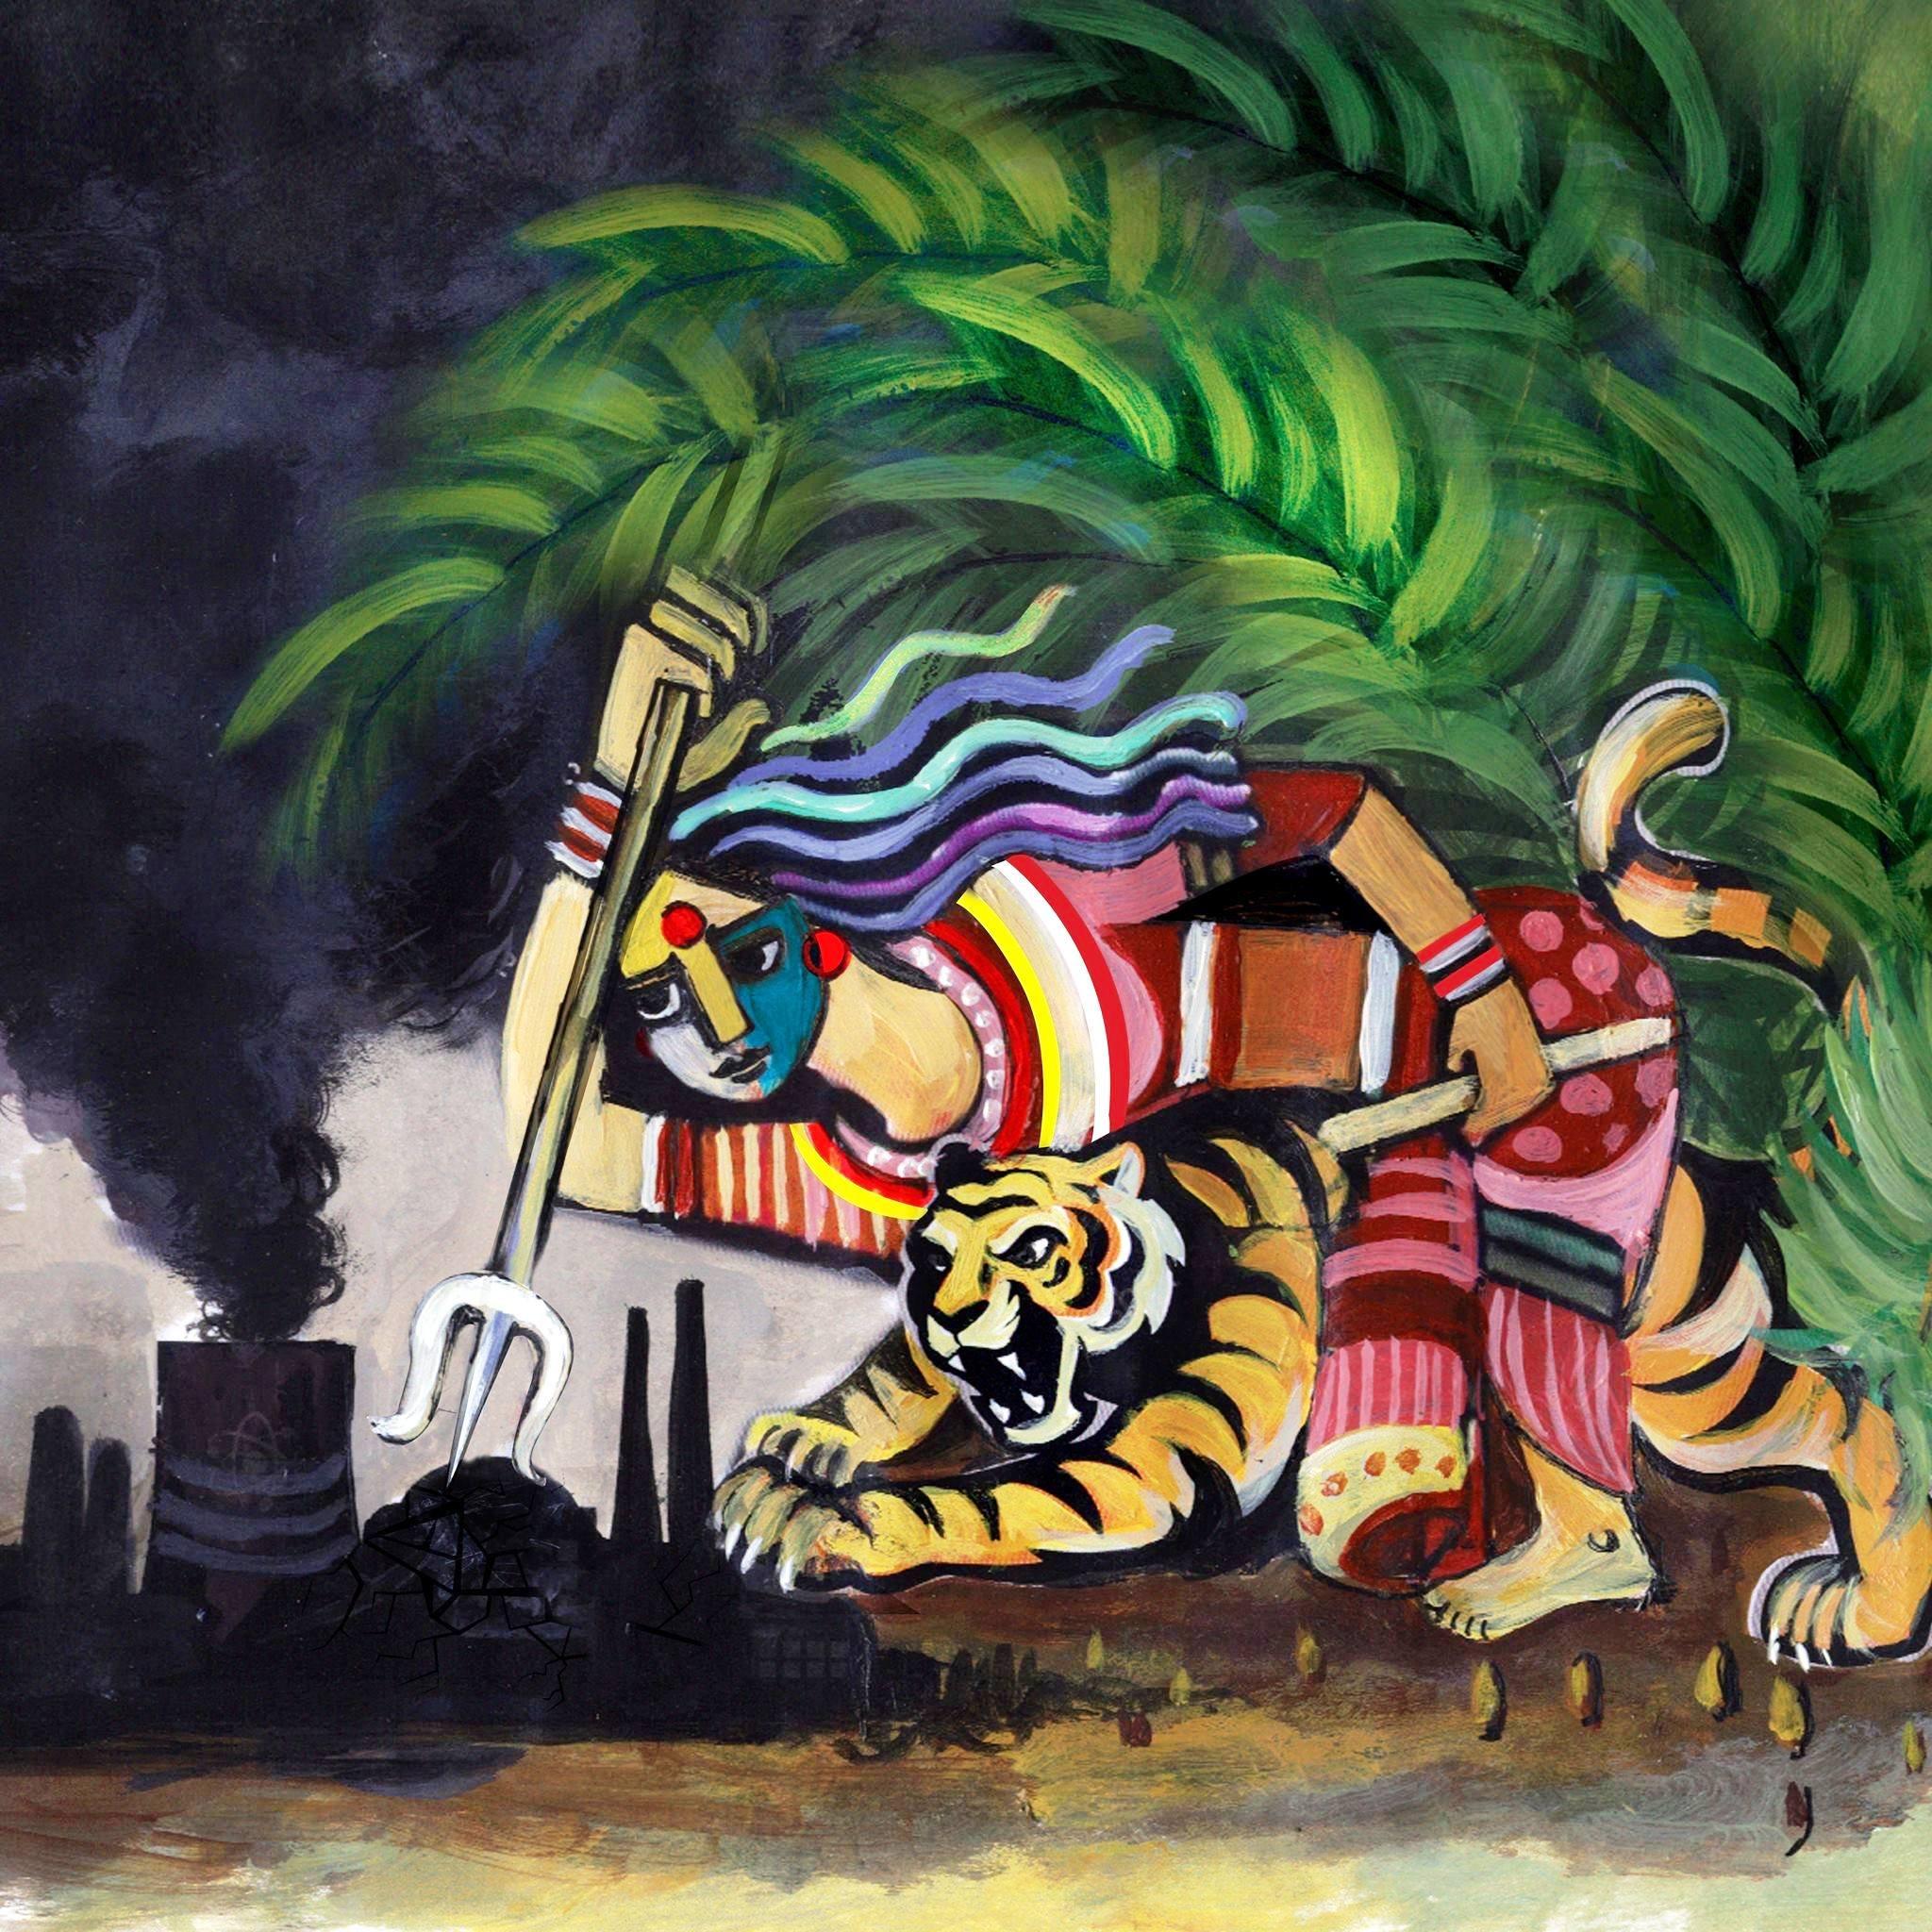 An artwork by Mita Mehedi.